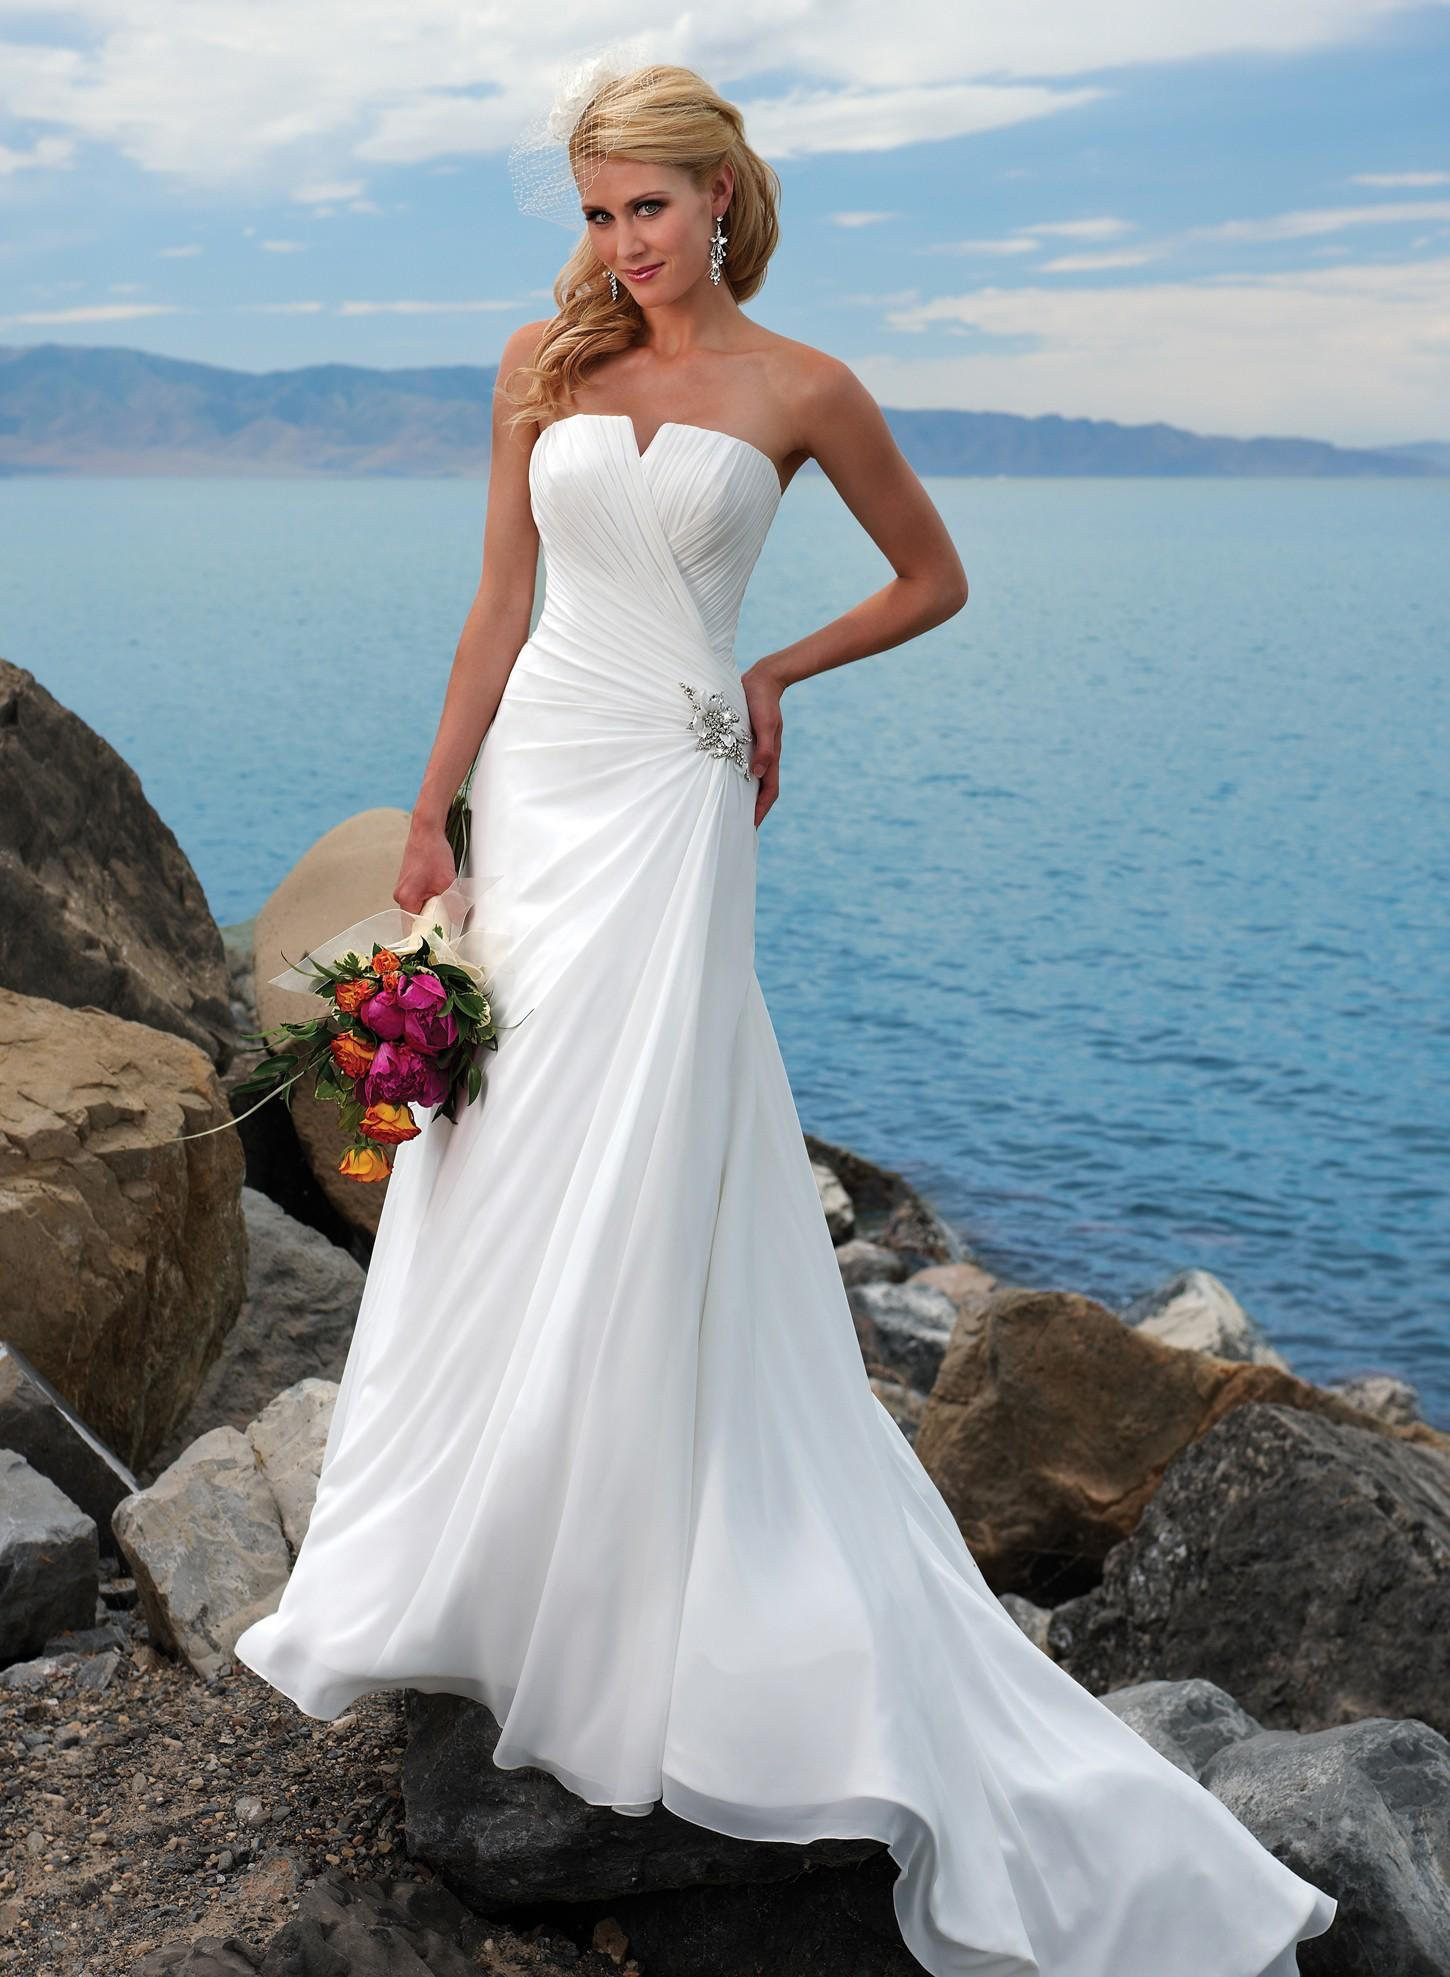 white strapless wedding dresses most popular wedding dresses white strapless wedding dresses